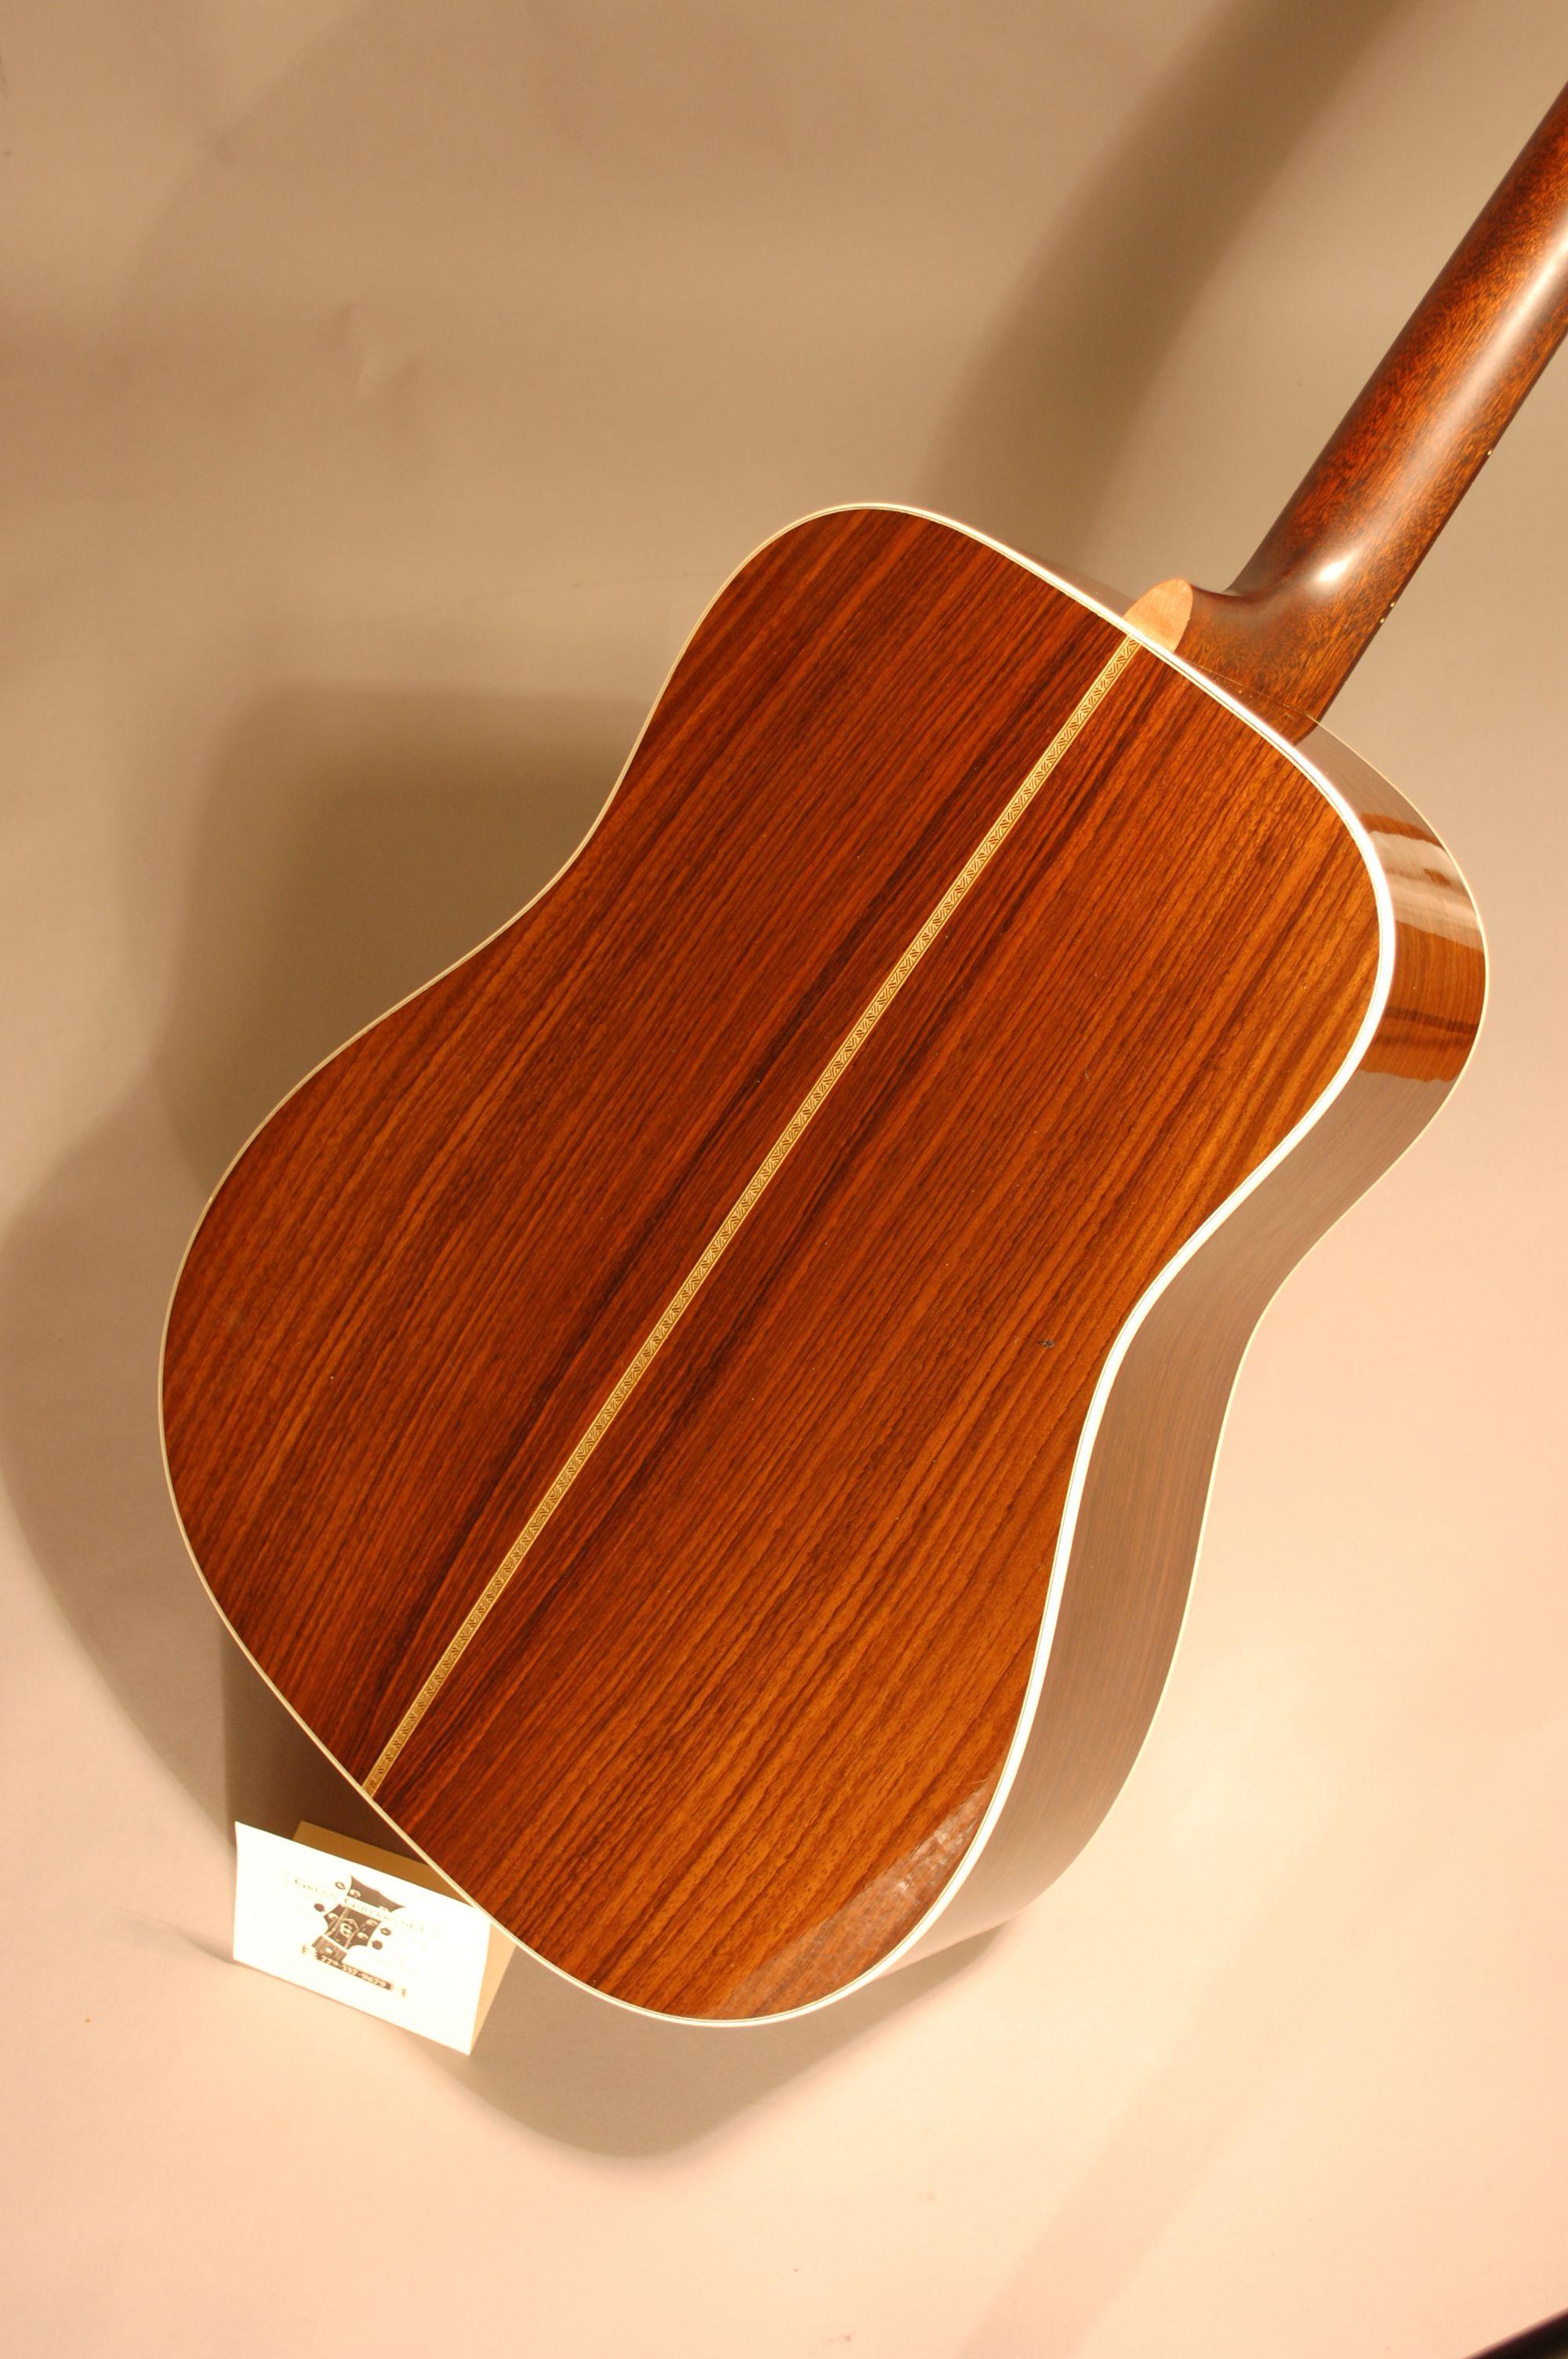 martin hd 28 2r vintage acoustic guitars for sale acoustic guitar for sale guitars for sale. Black Bedroom Furniture Sets. Home Design Ideas